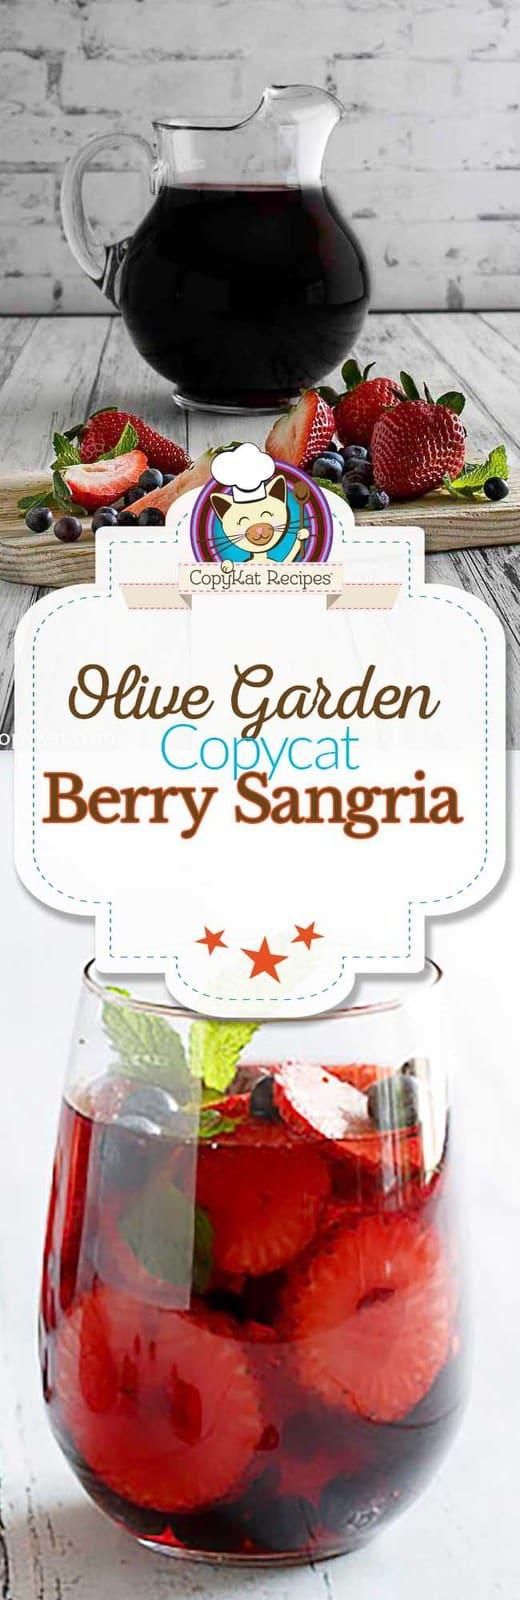 Olive Garden Berry Sangria Recipe